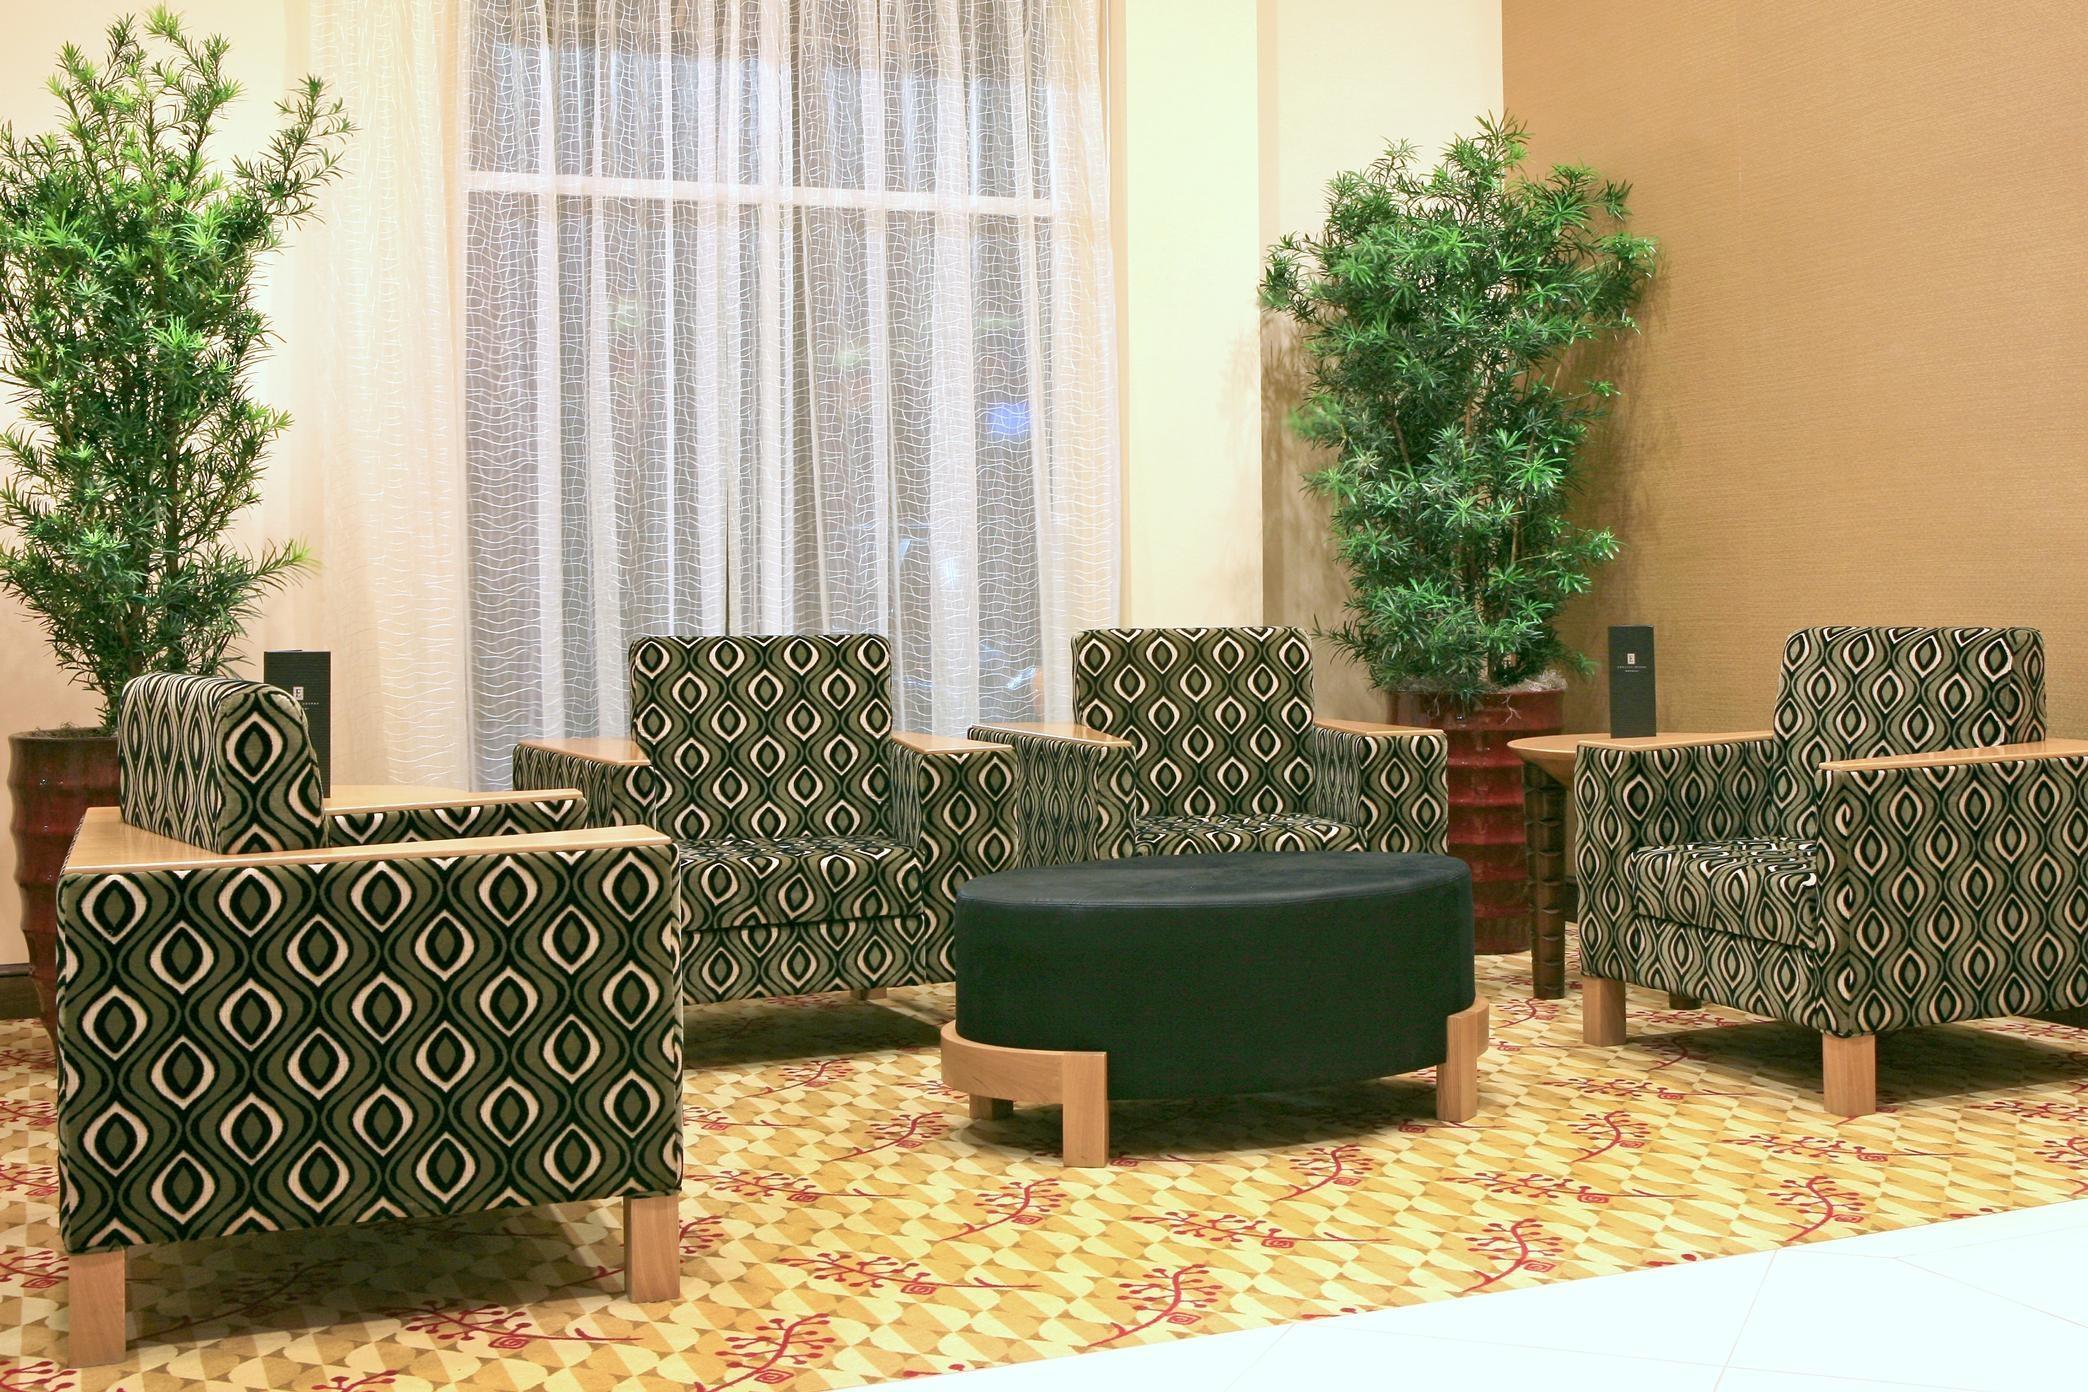 Embassy Suites by Hilton Birmingham Hoover image 4